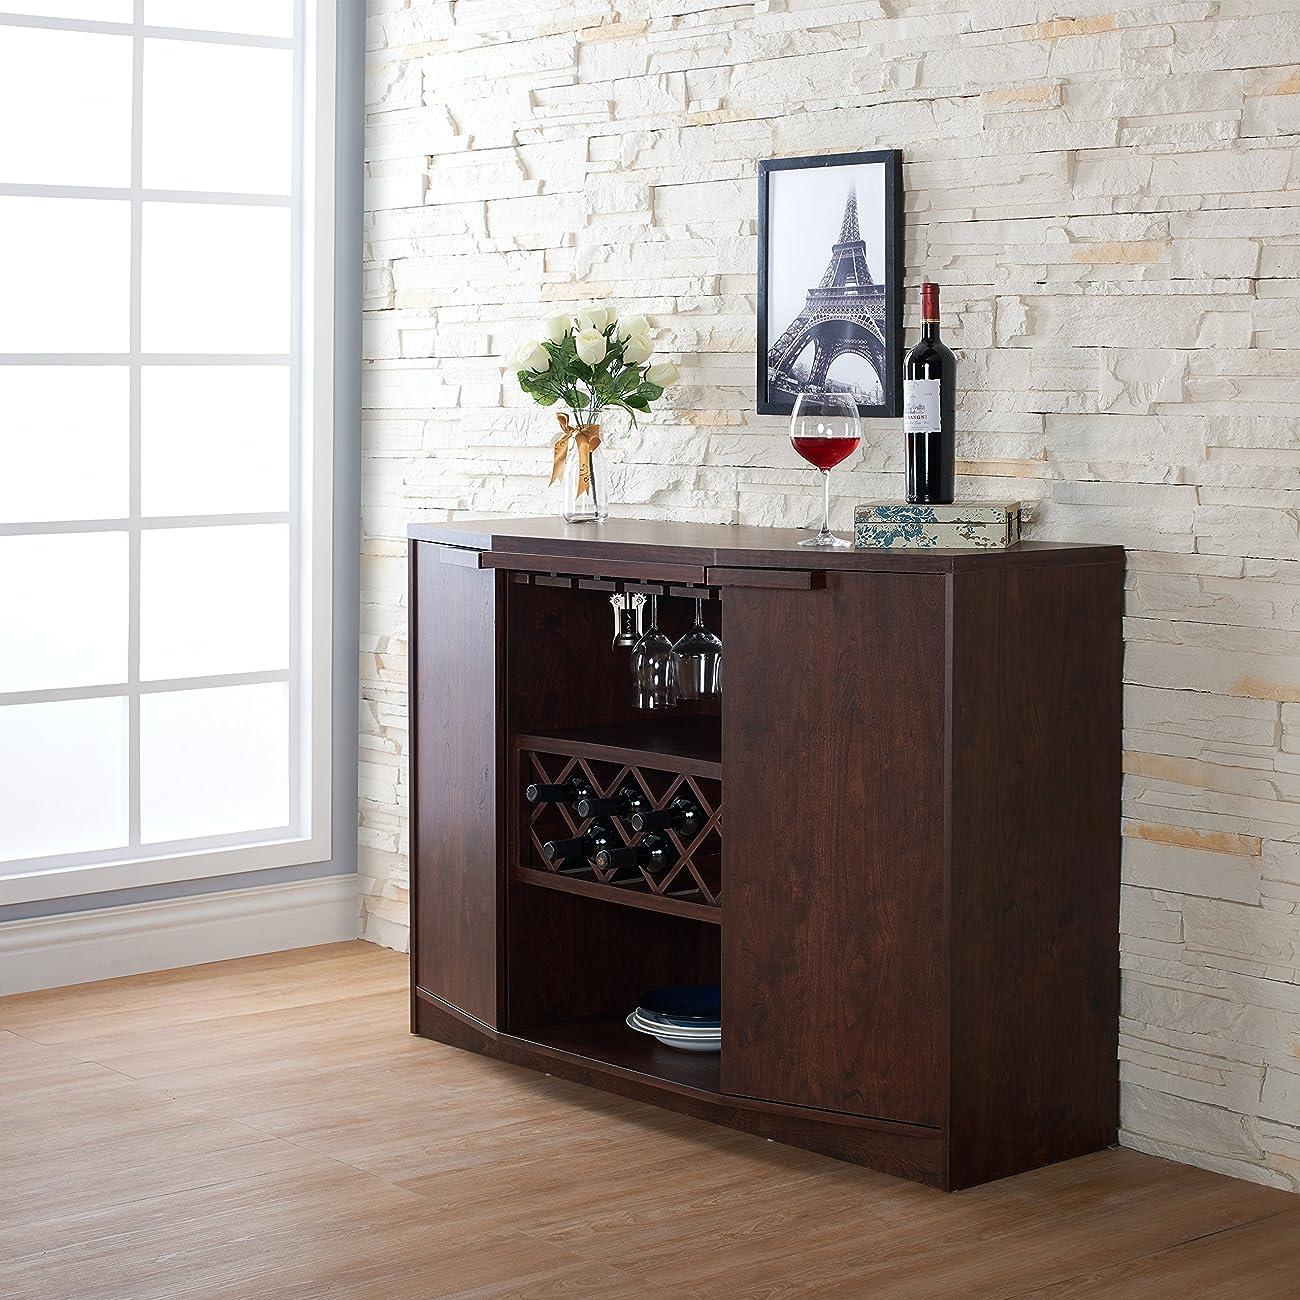 ioHOMES Annadel Wine Cabinet Buffet, Vintage Walnut 2